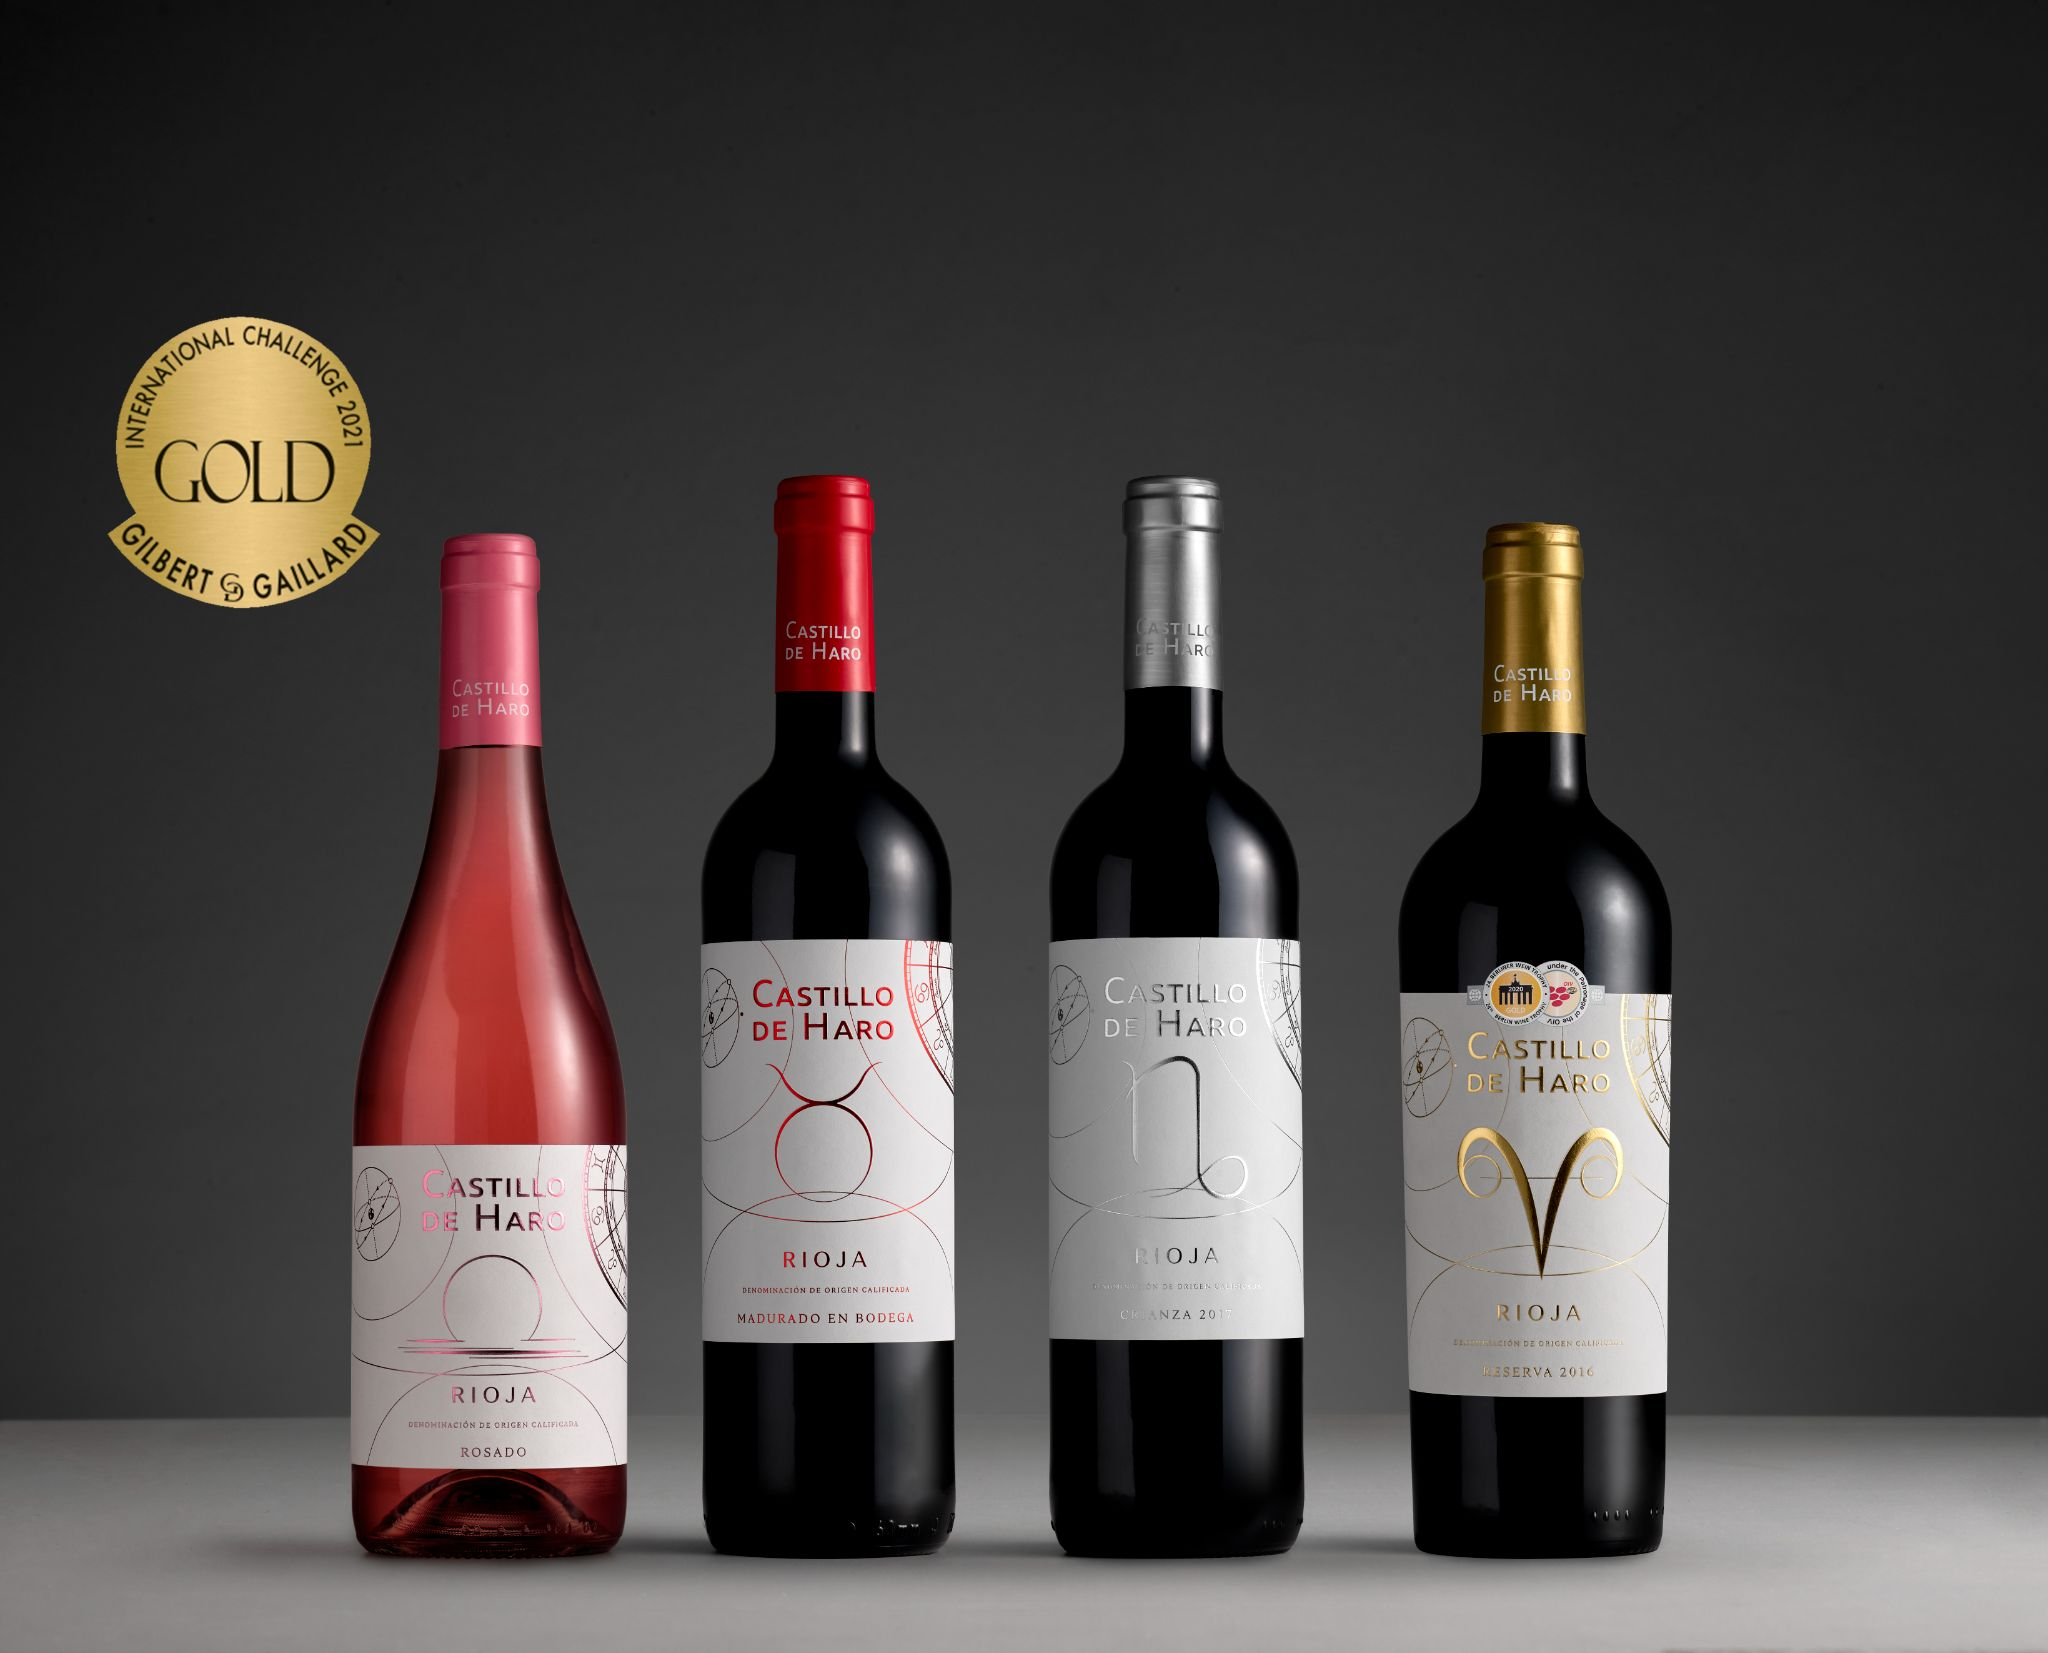 La bodega Rioja Premium de DIA recibe el oro de la guía internacional Gilbert & Galliard